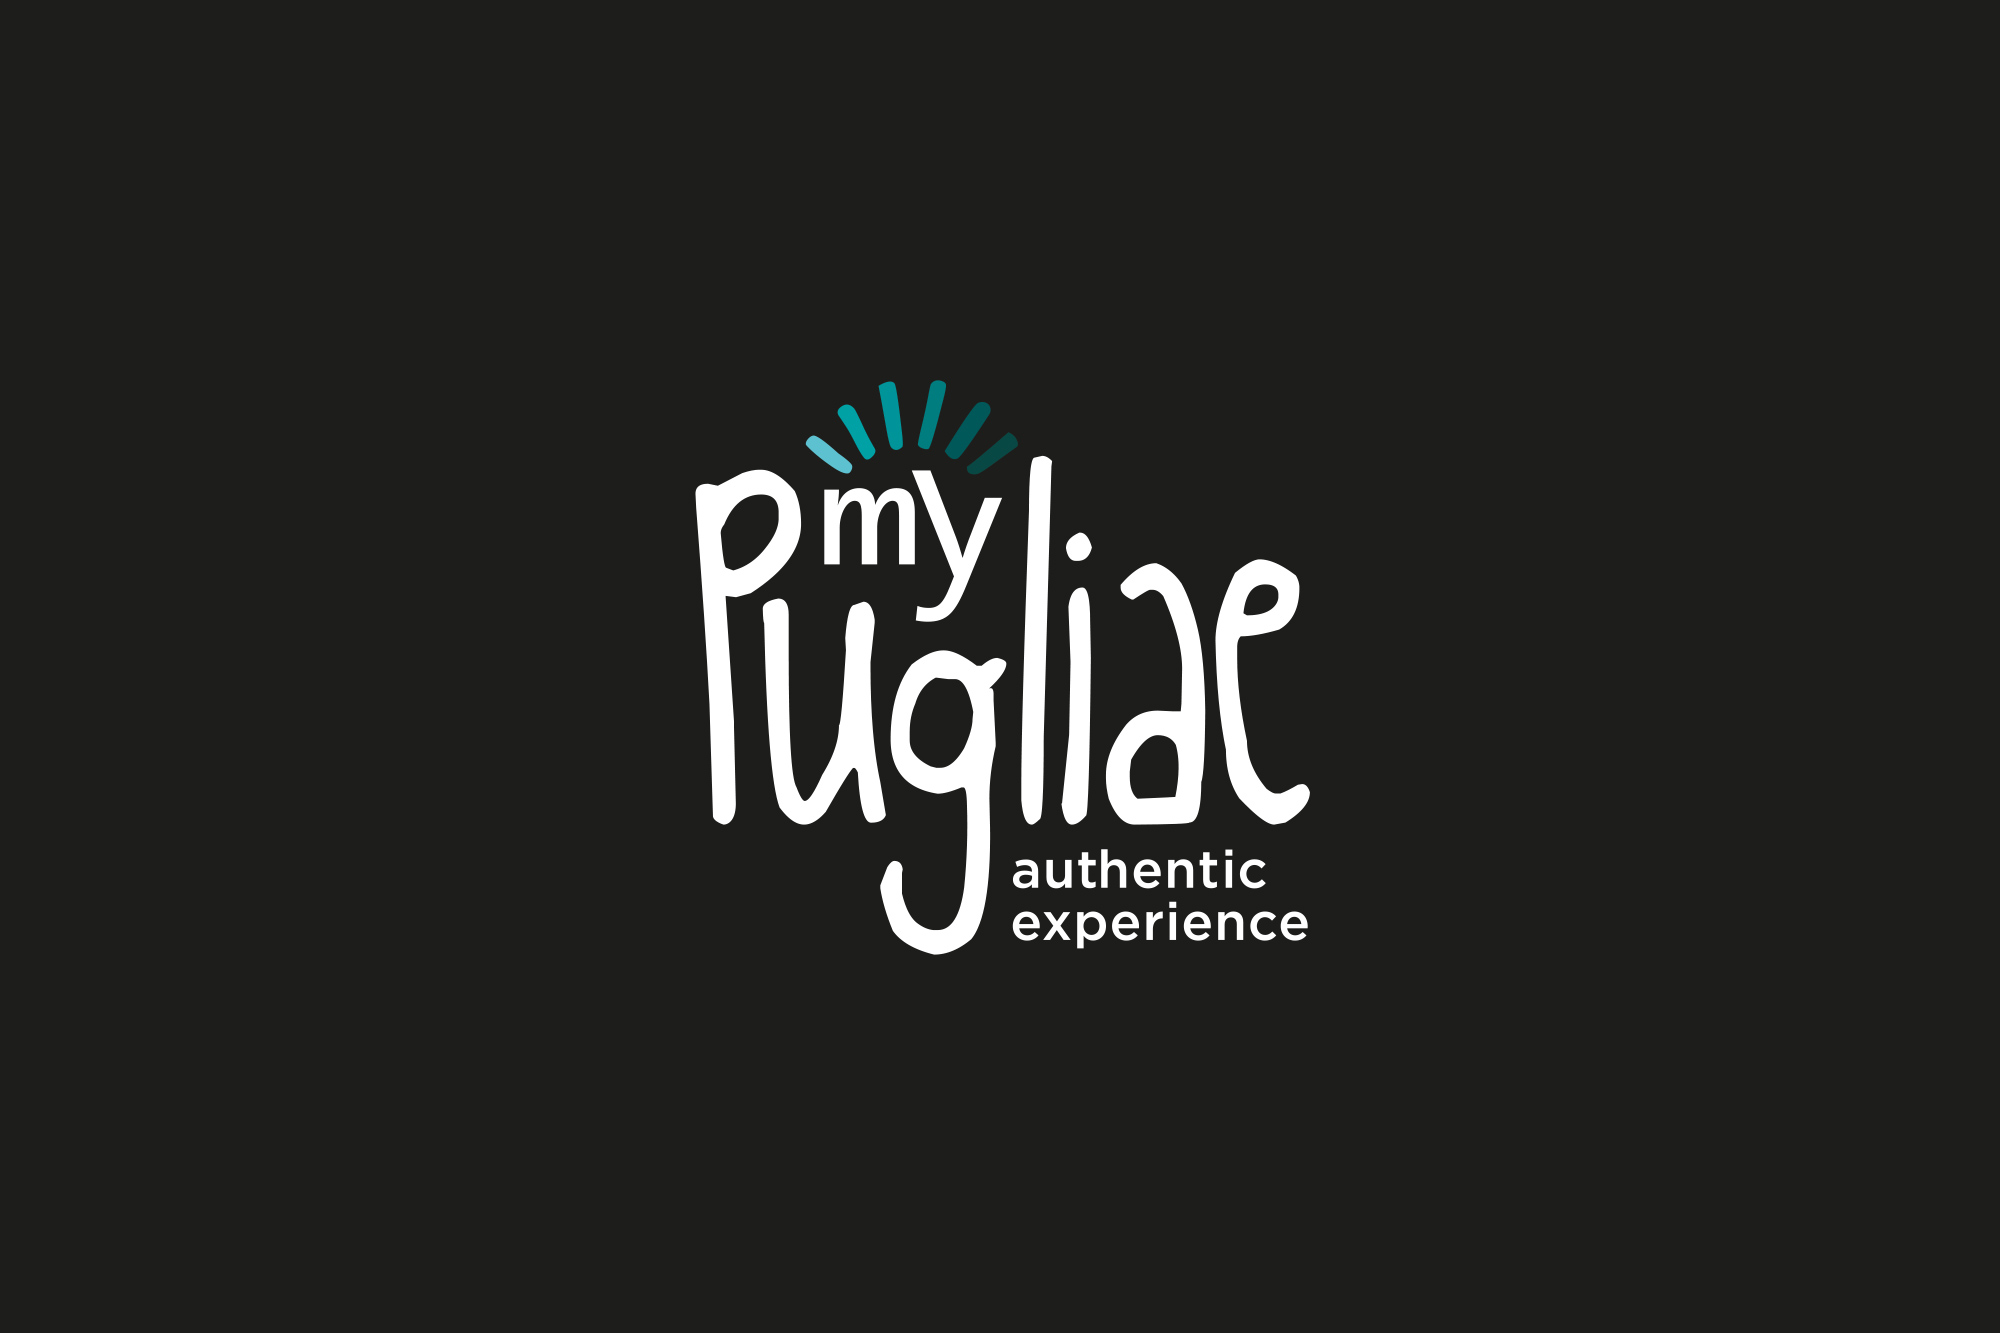 MyPugliae - logo/branding, digital, print - img 2